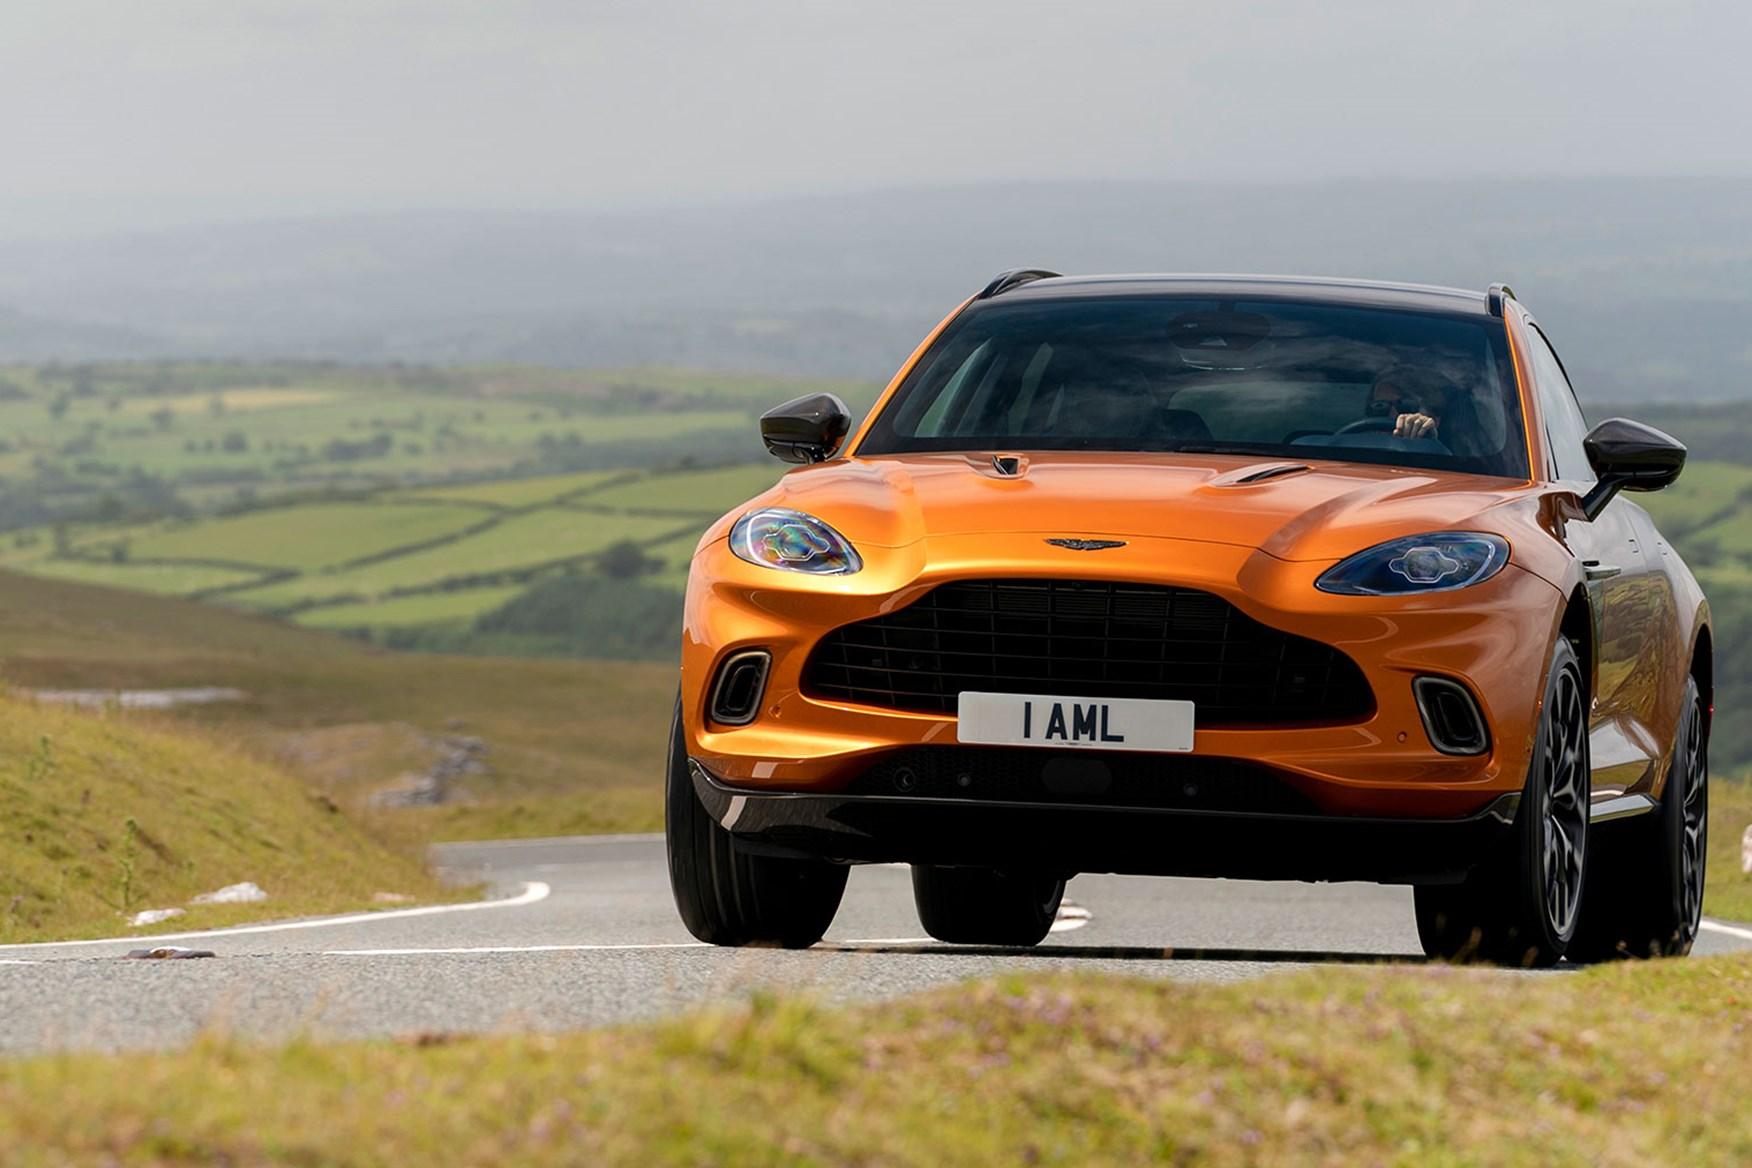 Aston Martin Dbx Suv Review 2020 Car Magazine